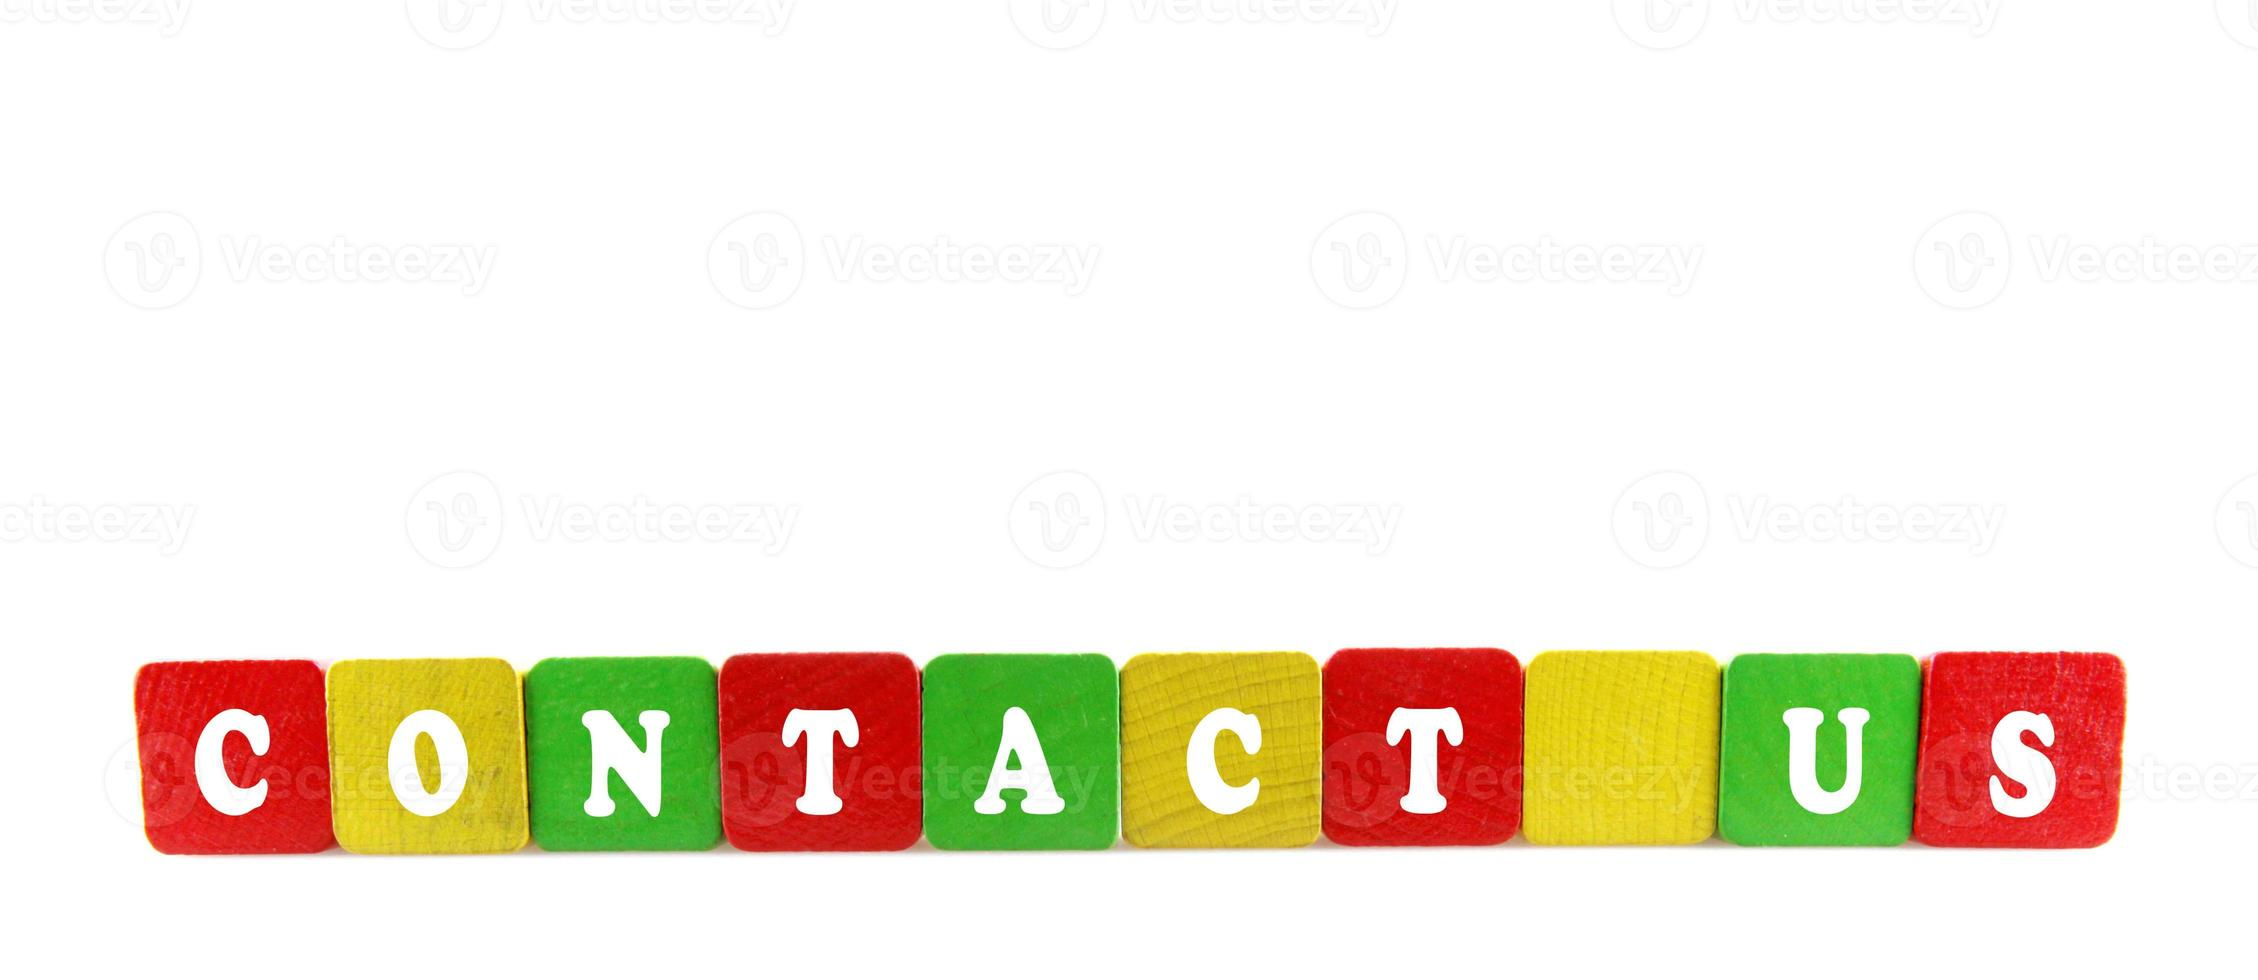 contact us concept photo